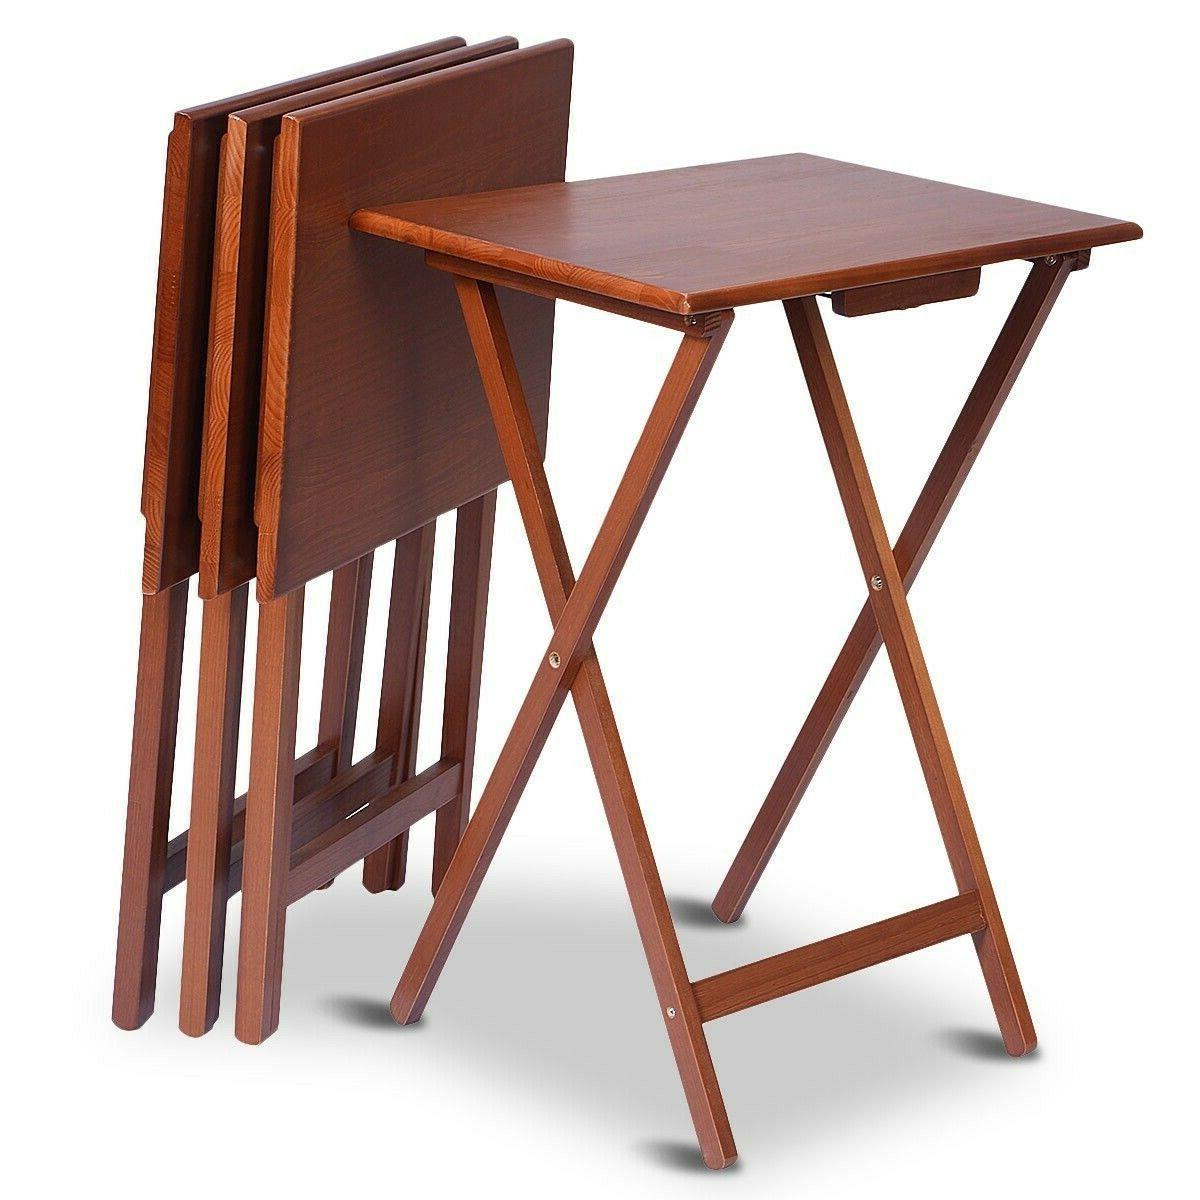 4 piece folding tv tray table set